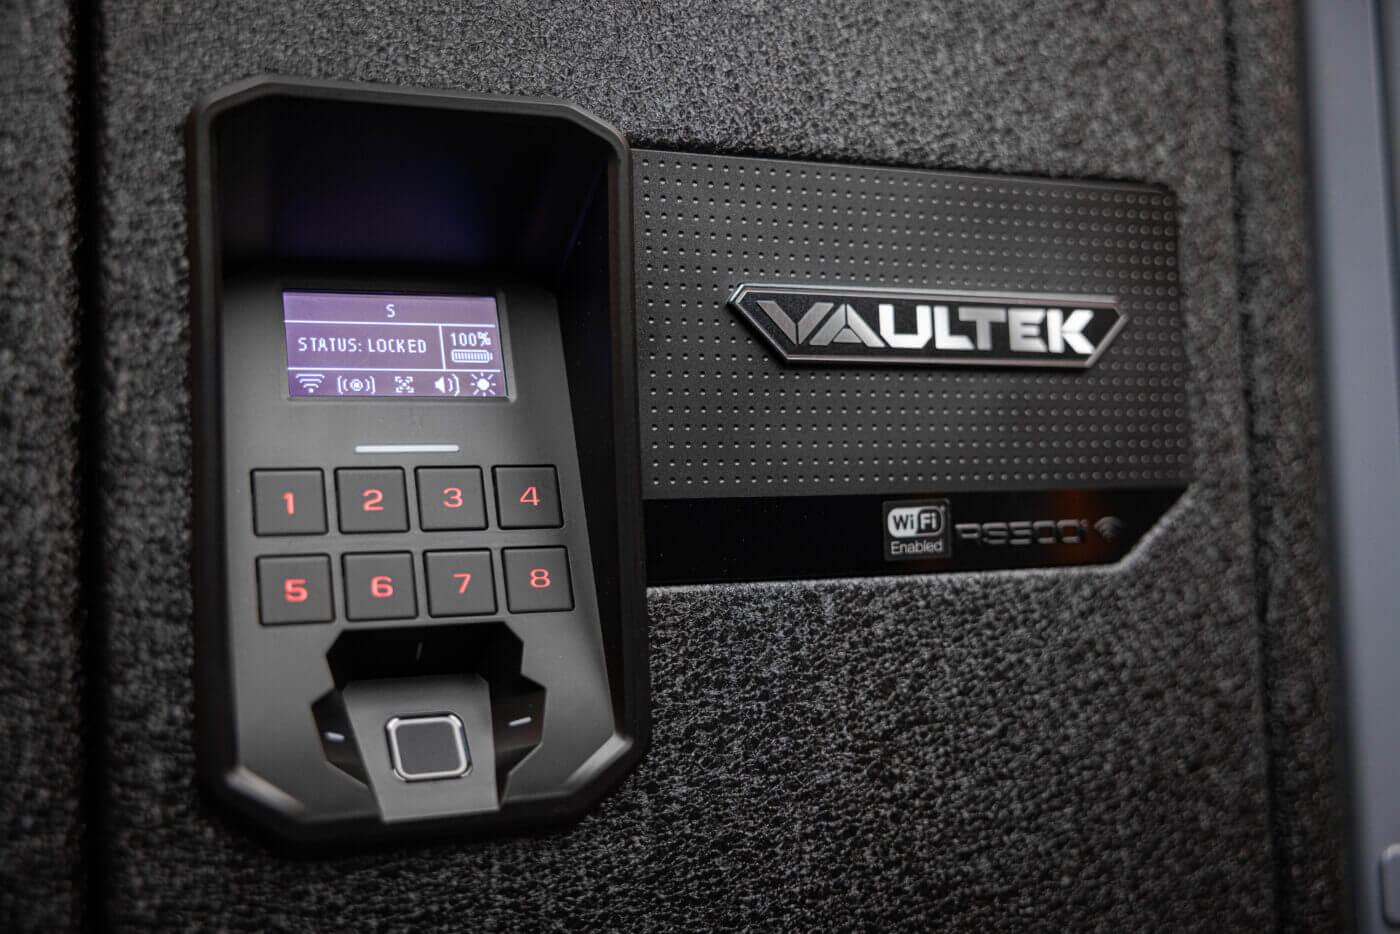 Vaultek RS500i keypad